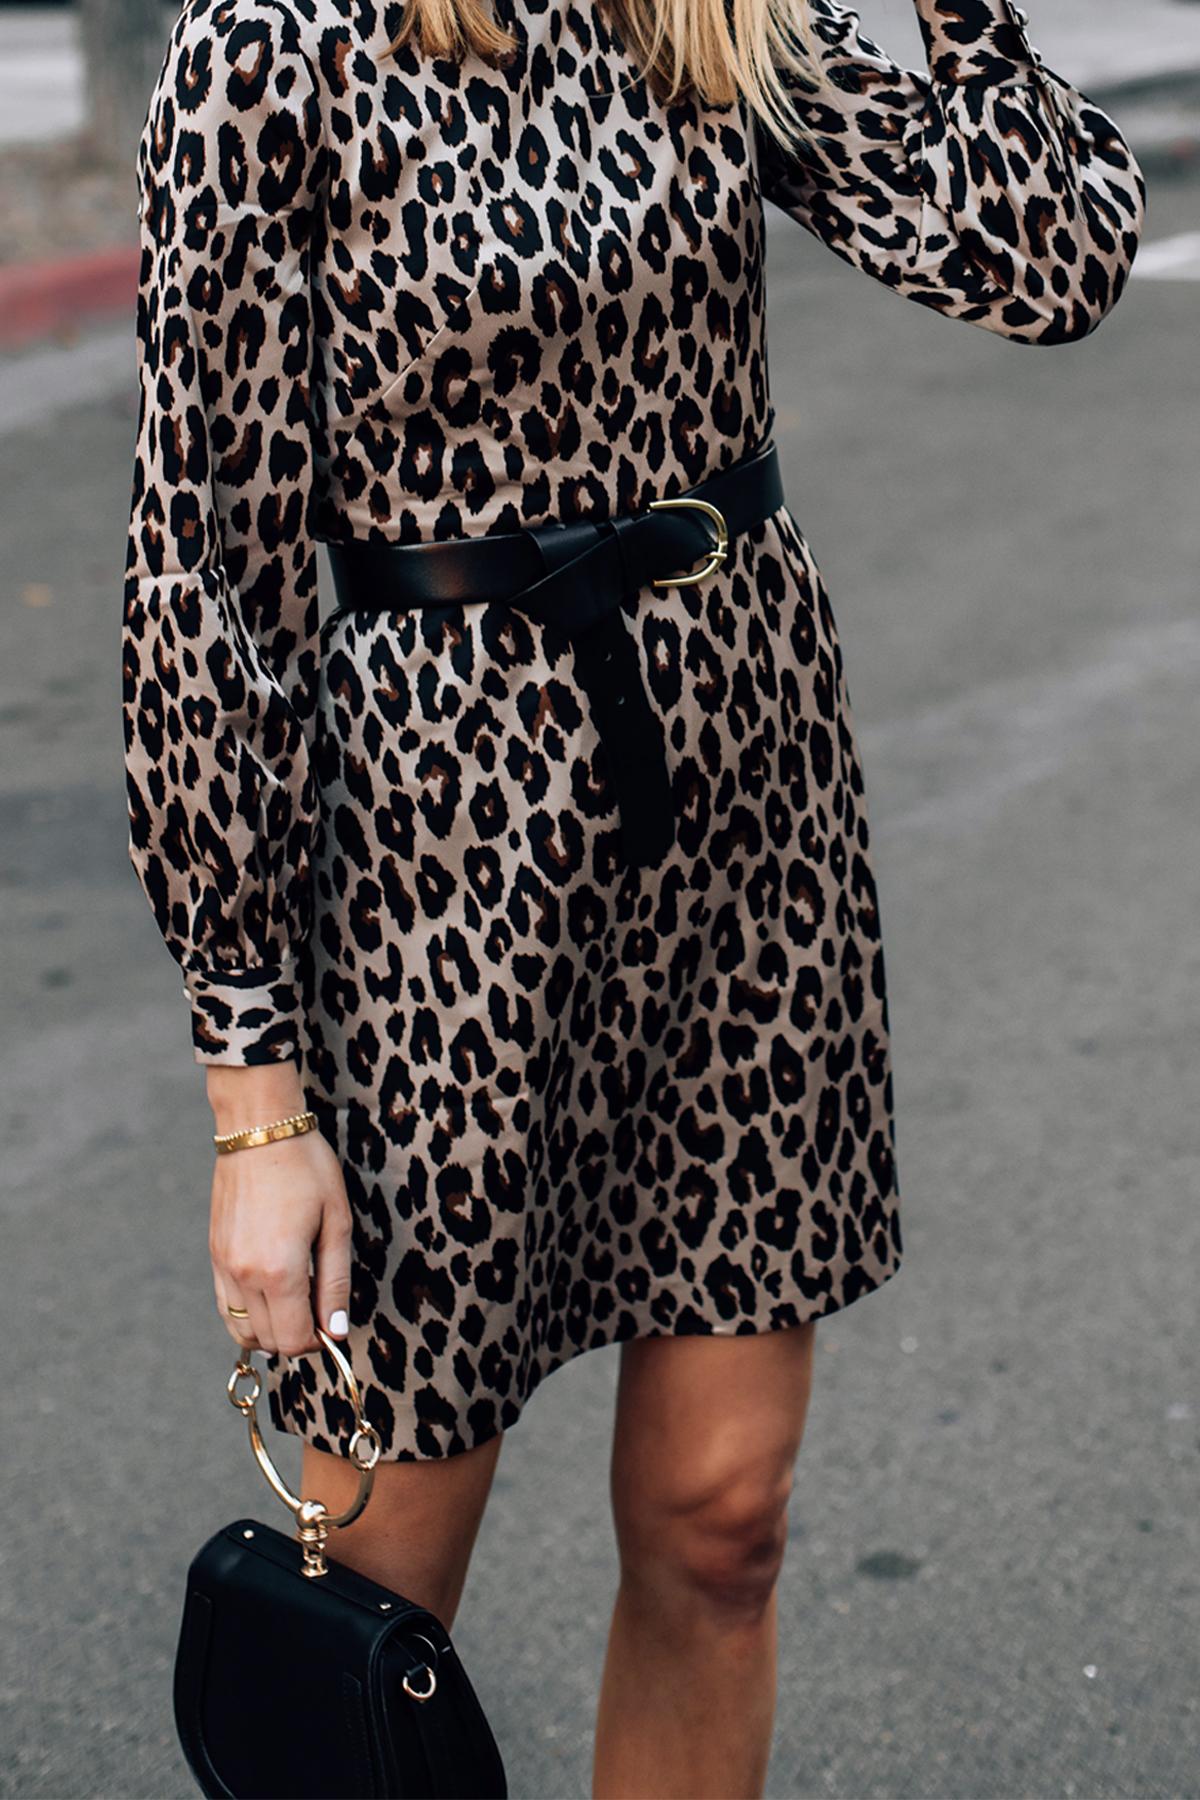 Woman Wearing Ann Taylor Leopard Dress with Black Belt Fashion Jackson San Diego Fashion Blogger Street Style